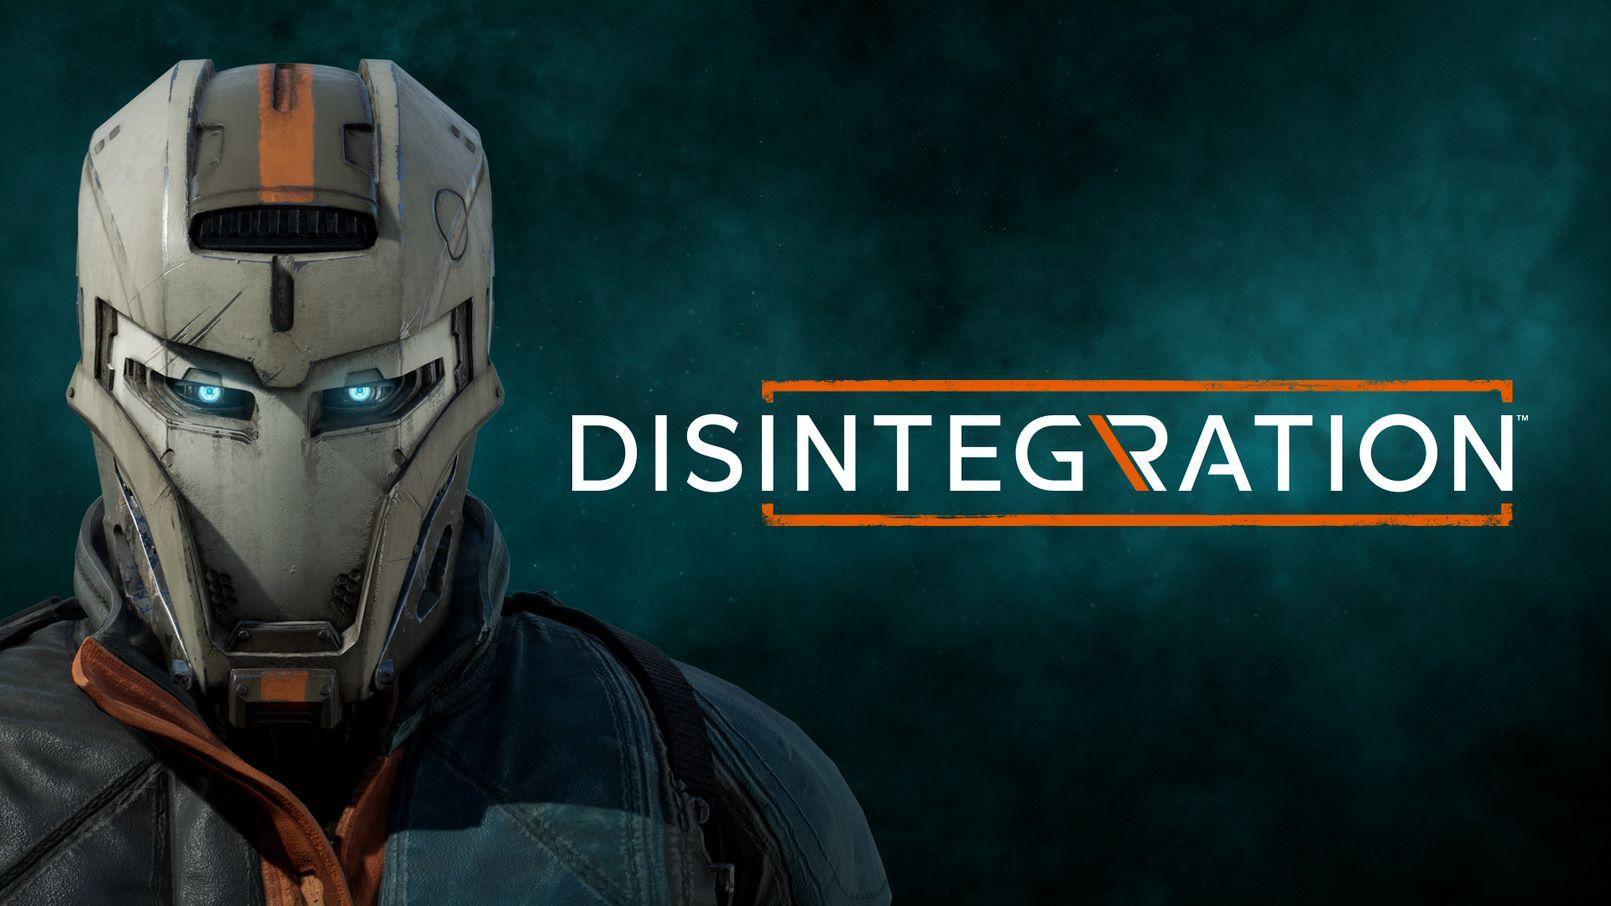 disintagration